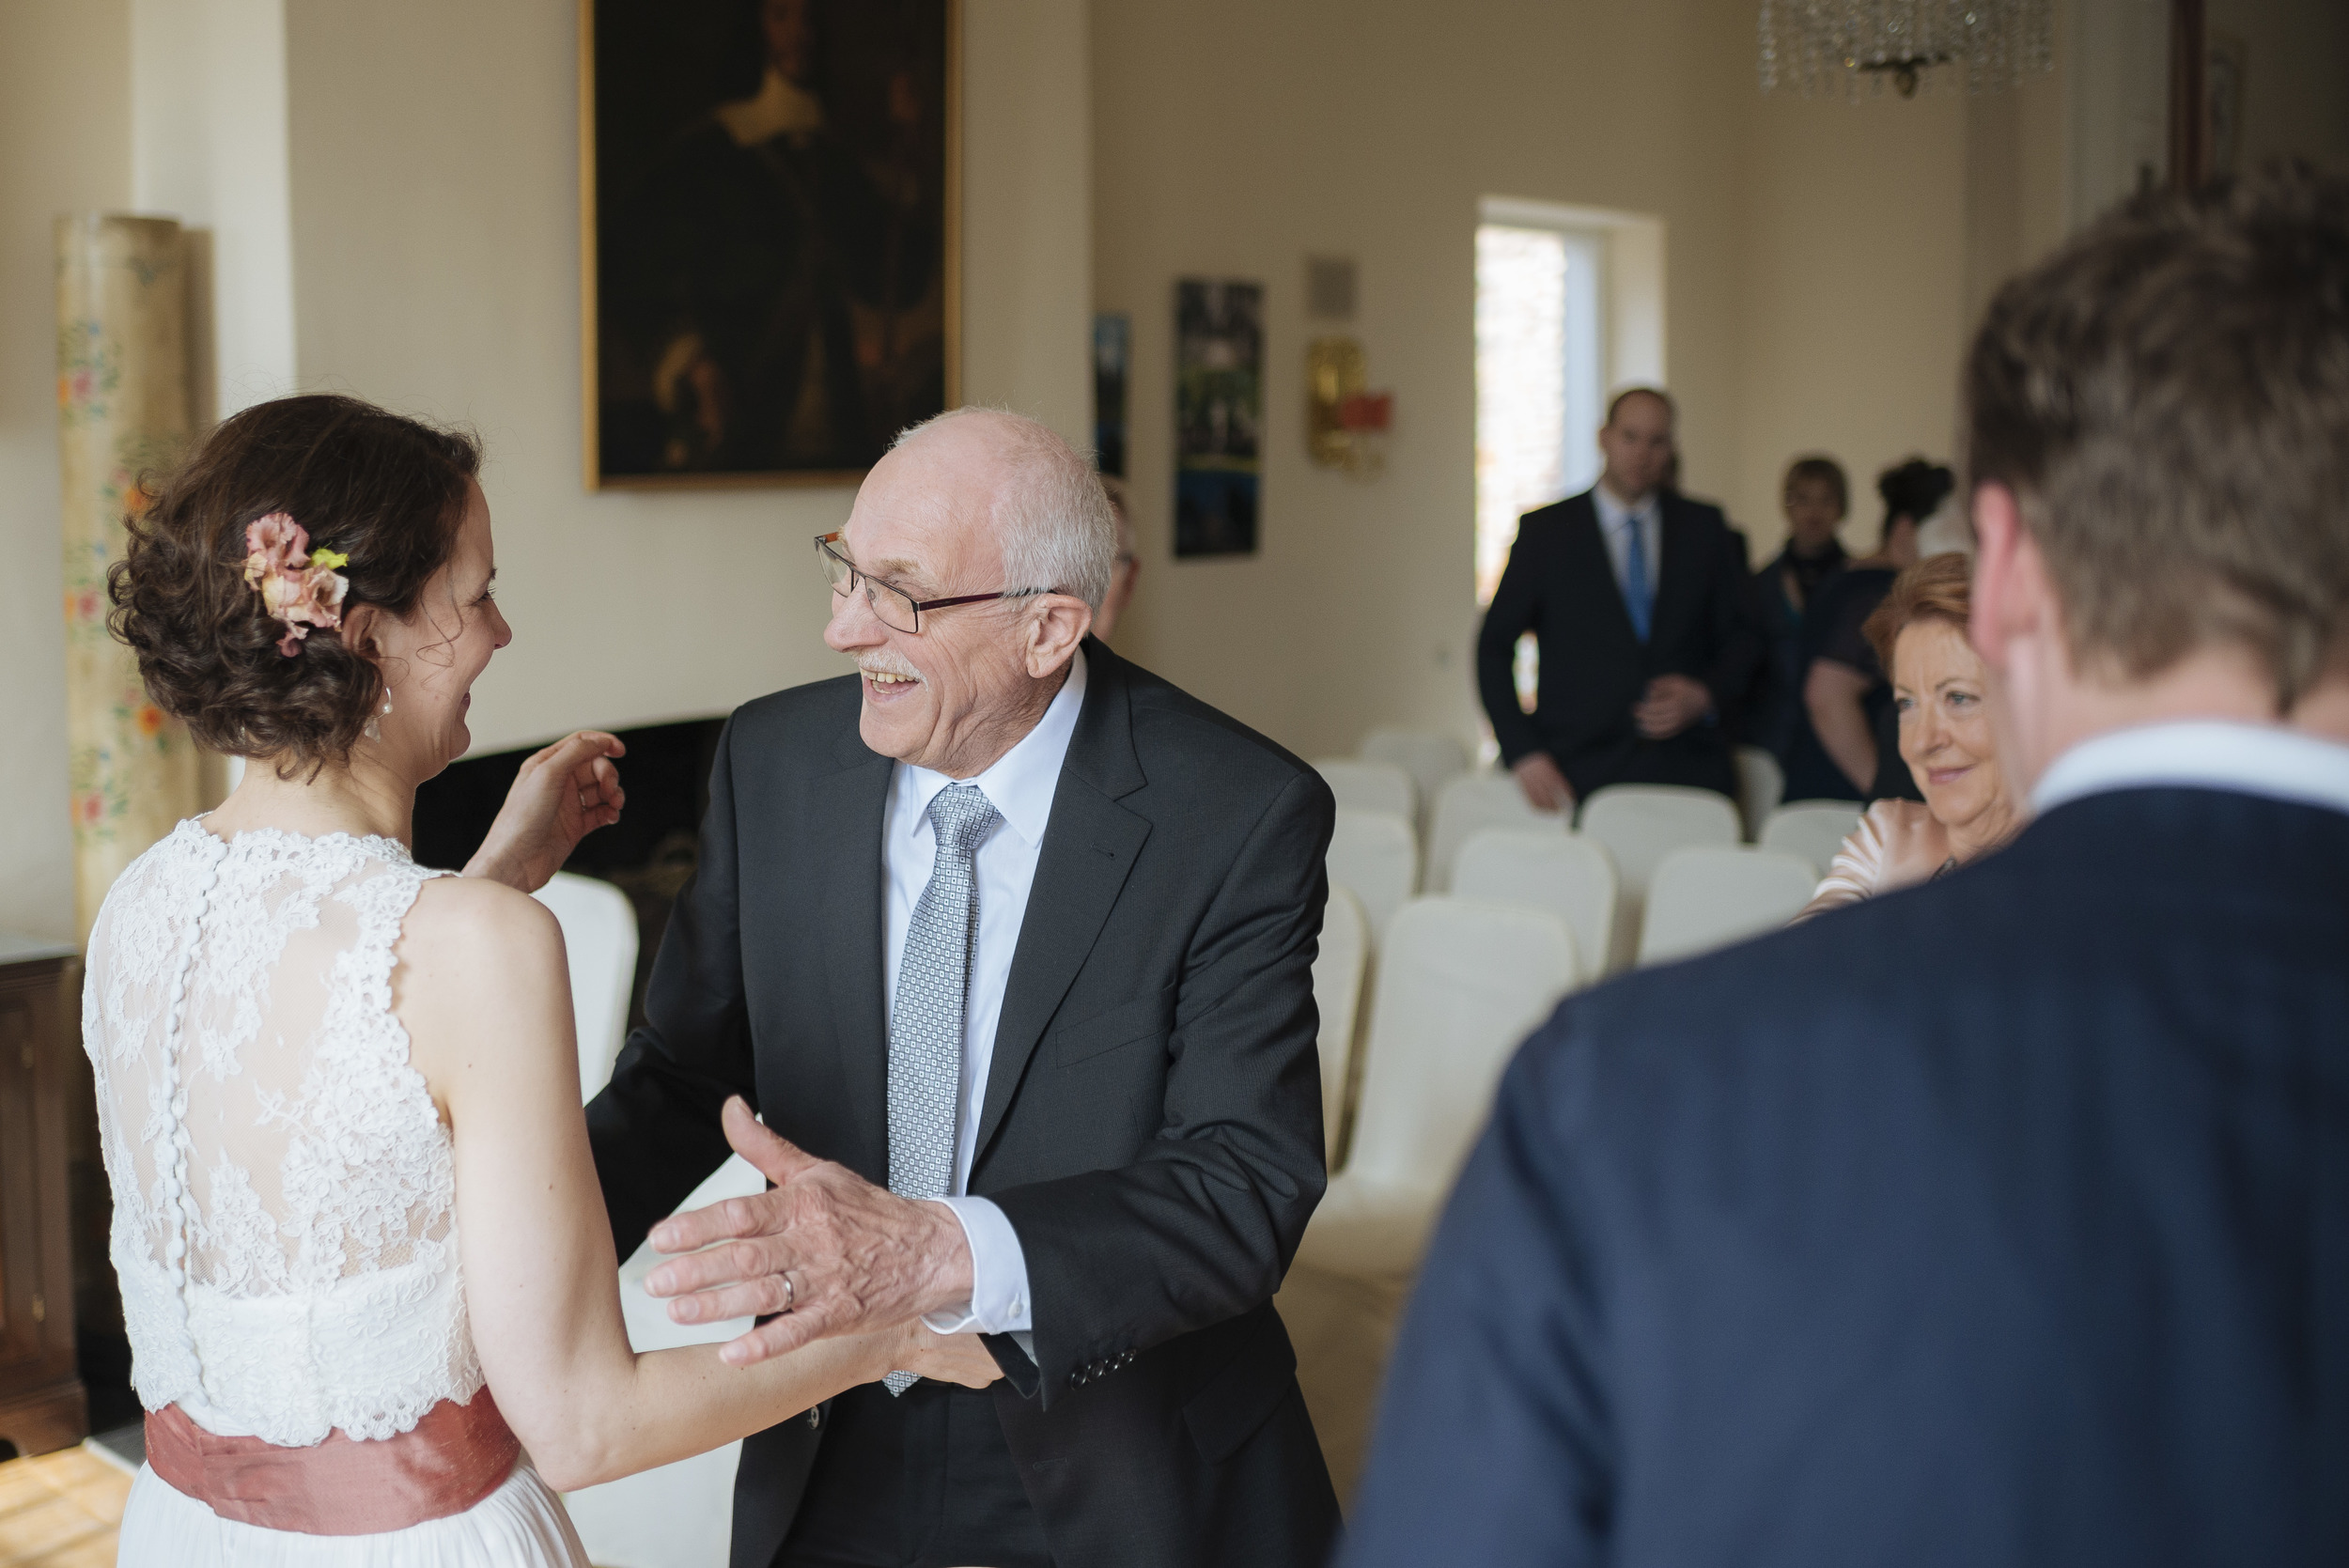 Hochzeitsfotograf-Schlossruine-Hertefeld-Weeze-082.jpg